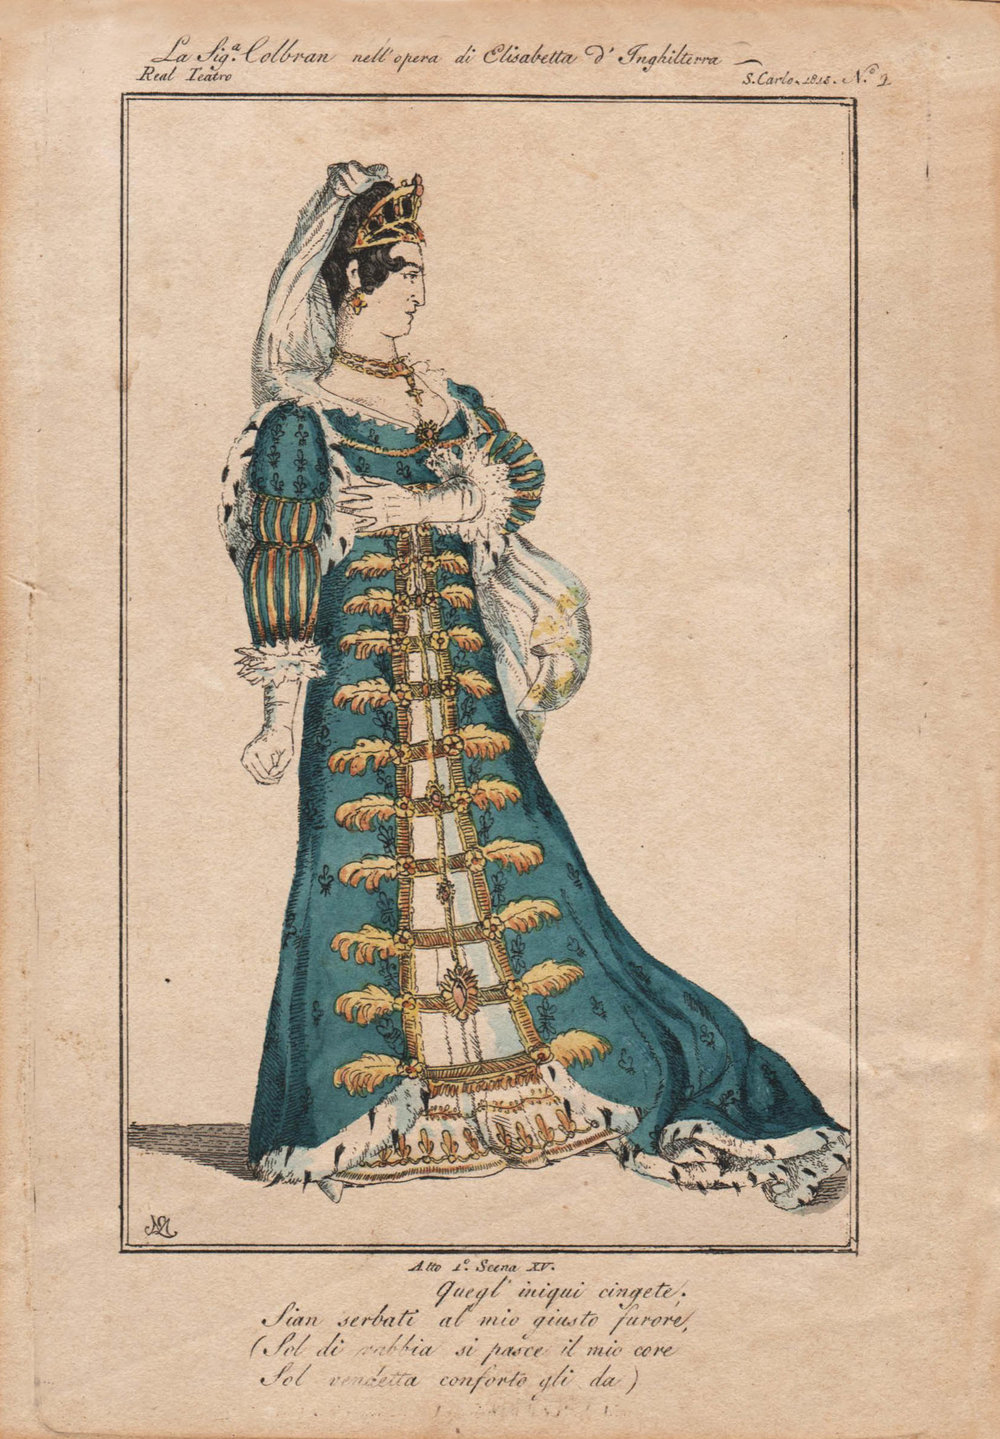 / Elisabetta regina d'Inghilterra     Isabella Colbran nel ruolo di Elisabetta regina d'Inghilterra. Incisione acquerellata, Napoli, 1818.